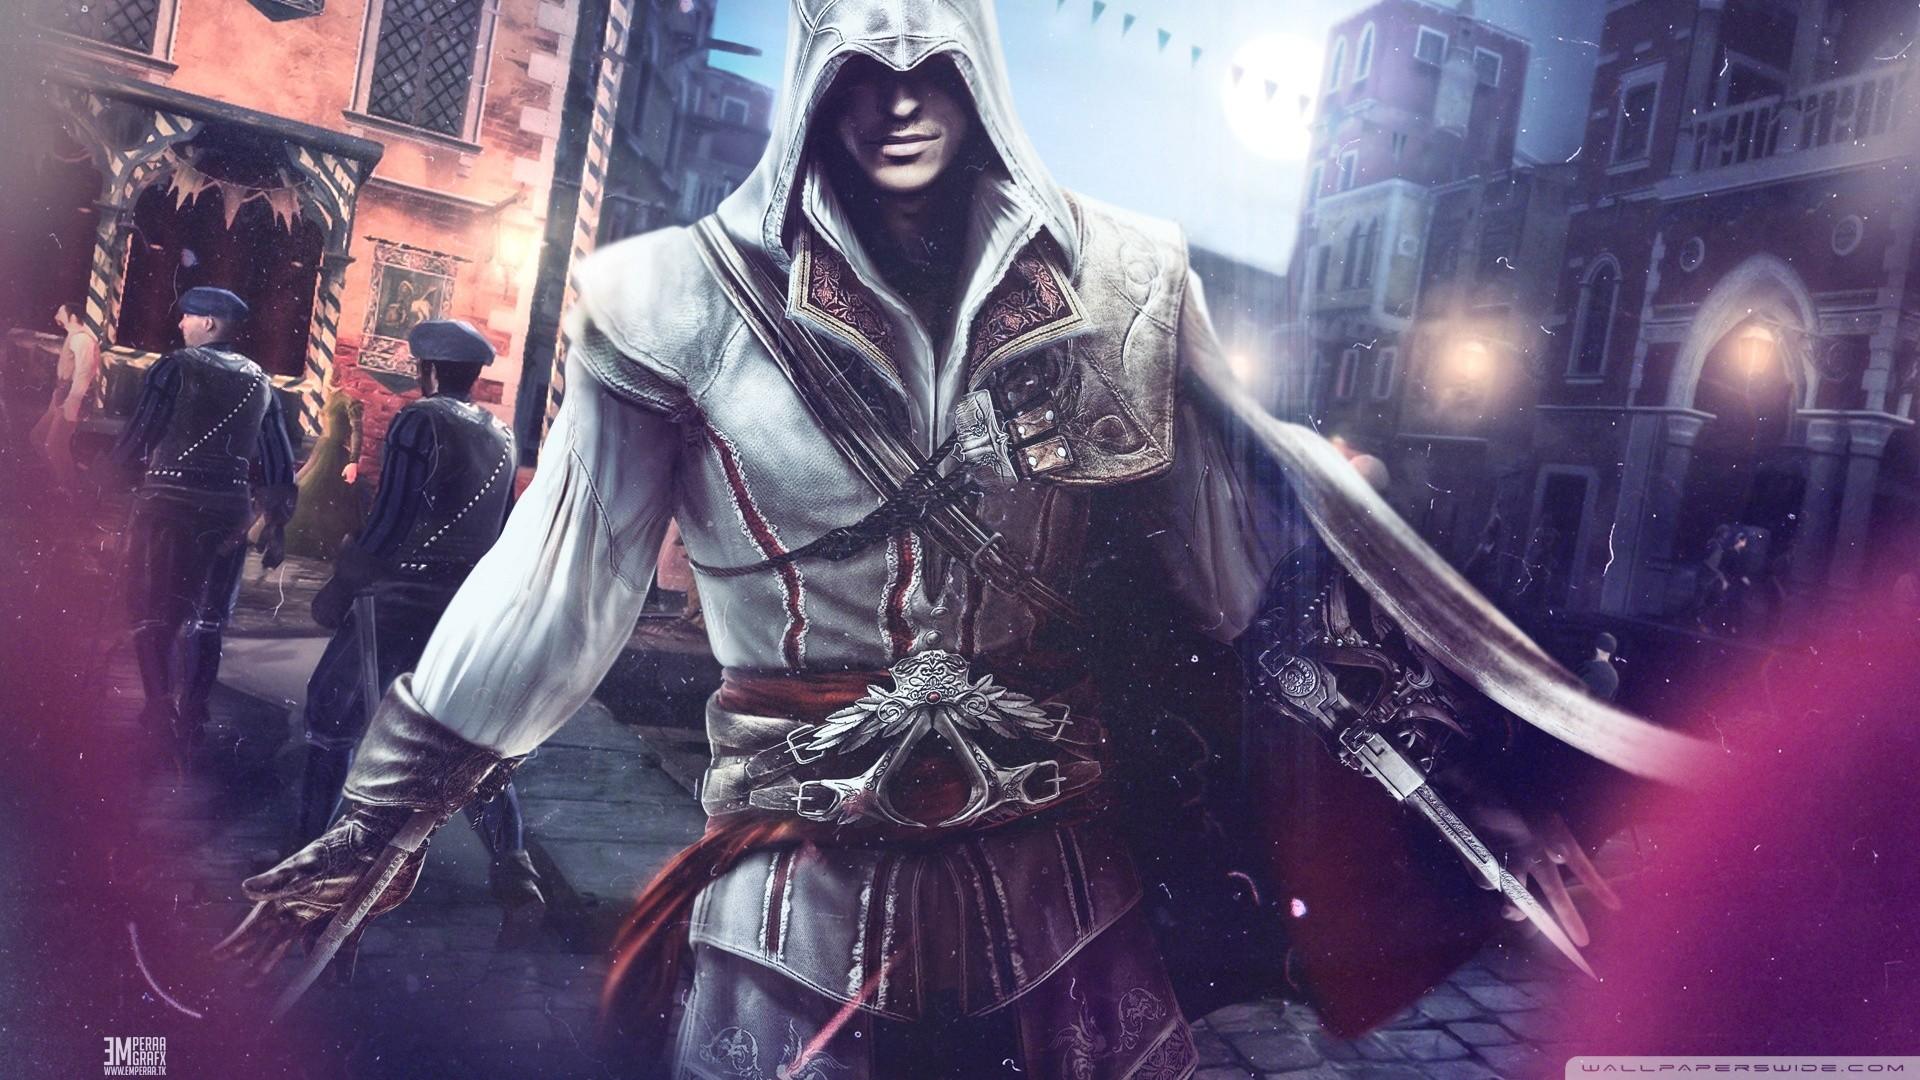 49+ Ezio Auditore Wallpaper on WallpaperSafari